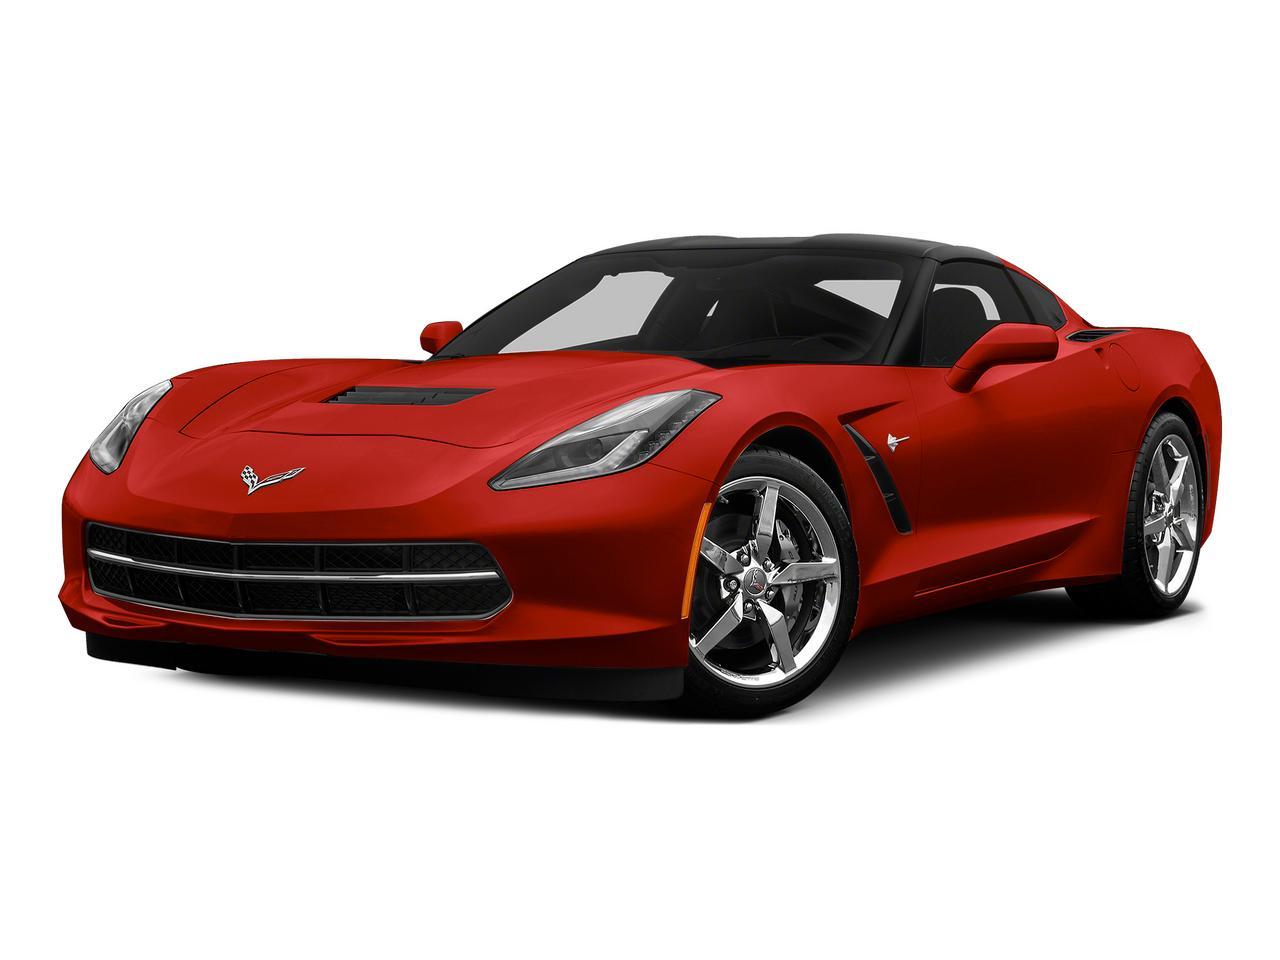 2015 Chevrolet Corvette Vehicle Photo in Novato, CA 94945